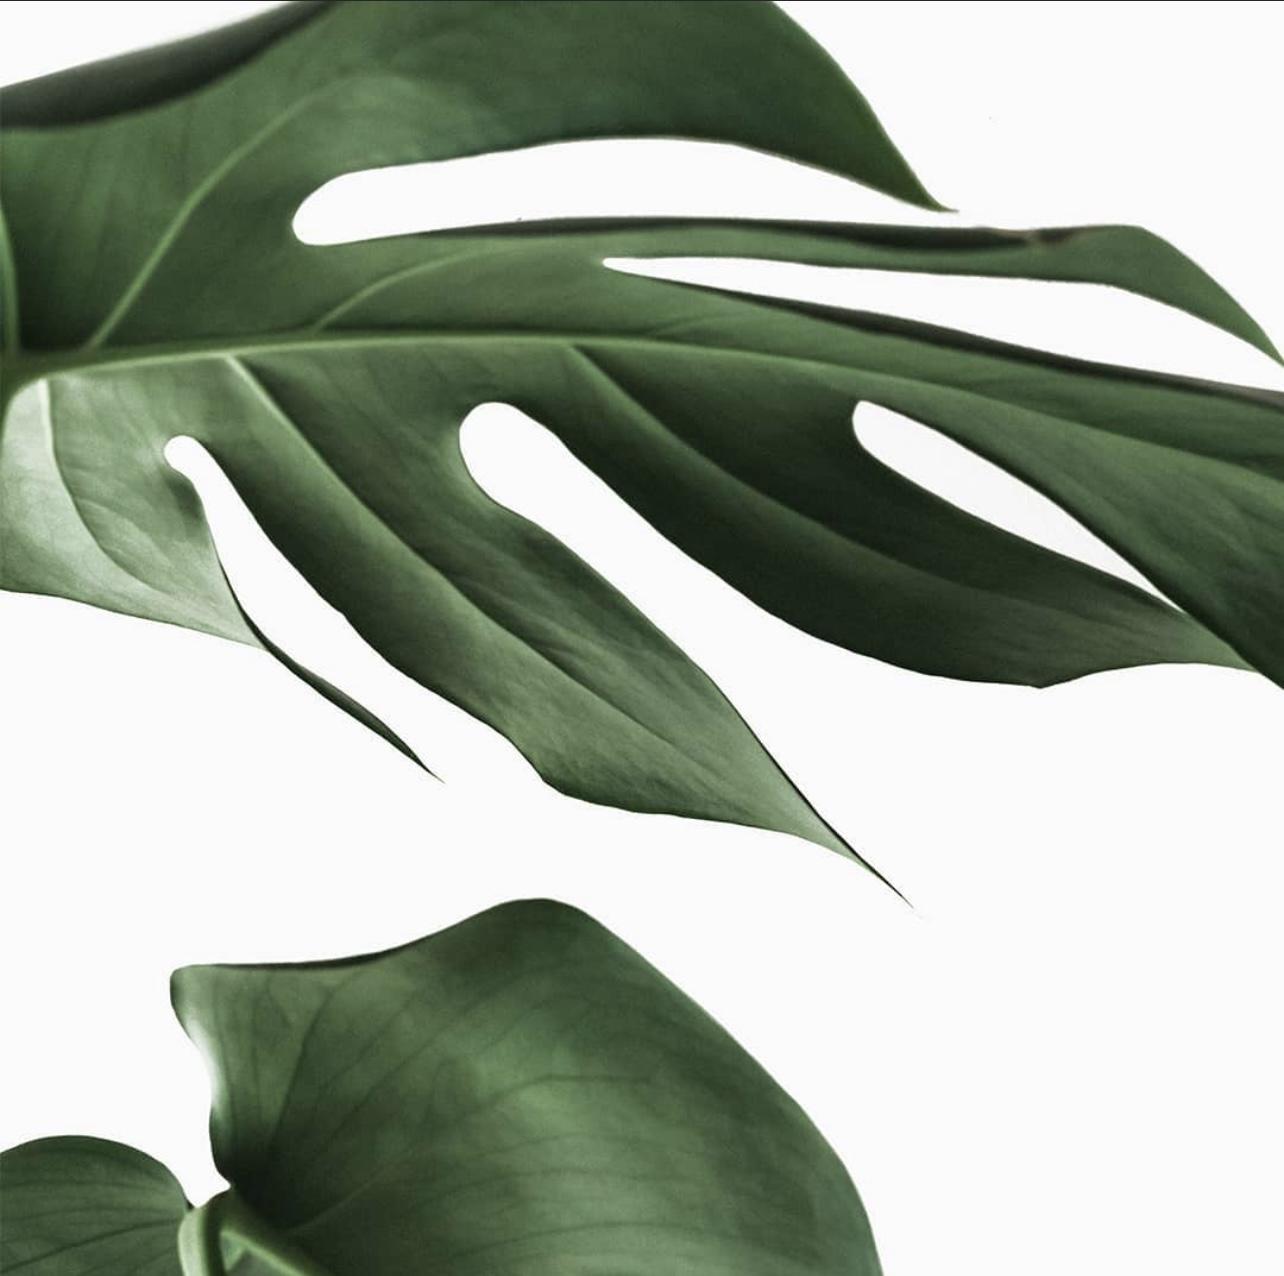 Microblading • Lashlifting • Browlifting • Hydra Beauty